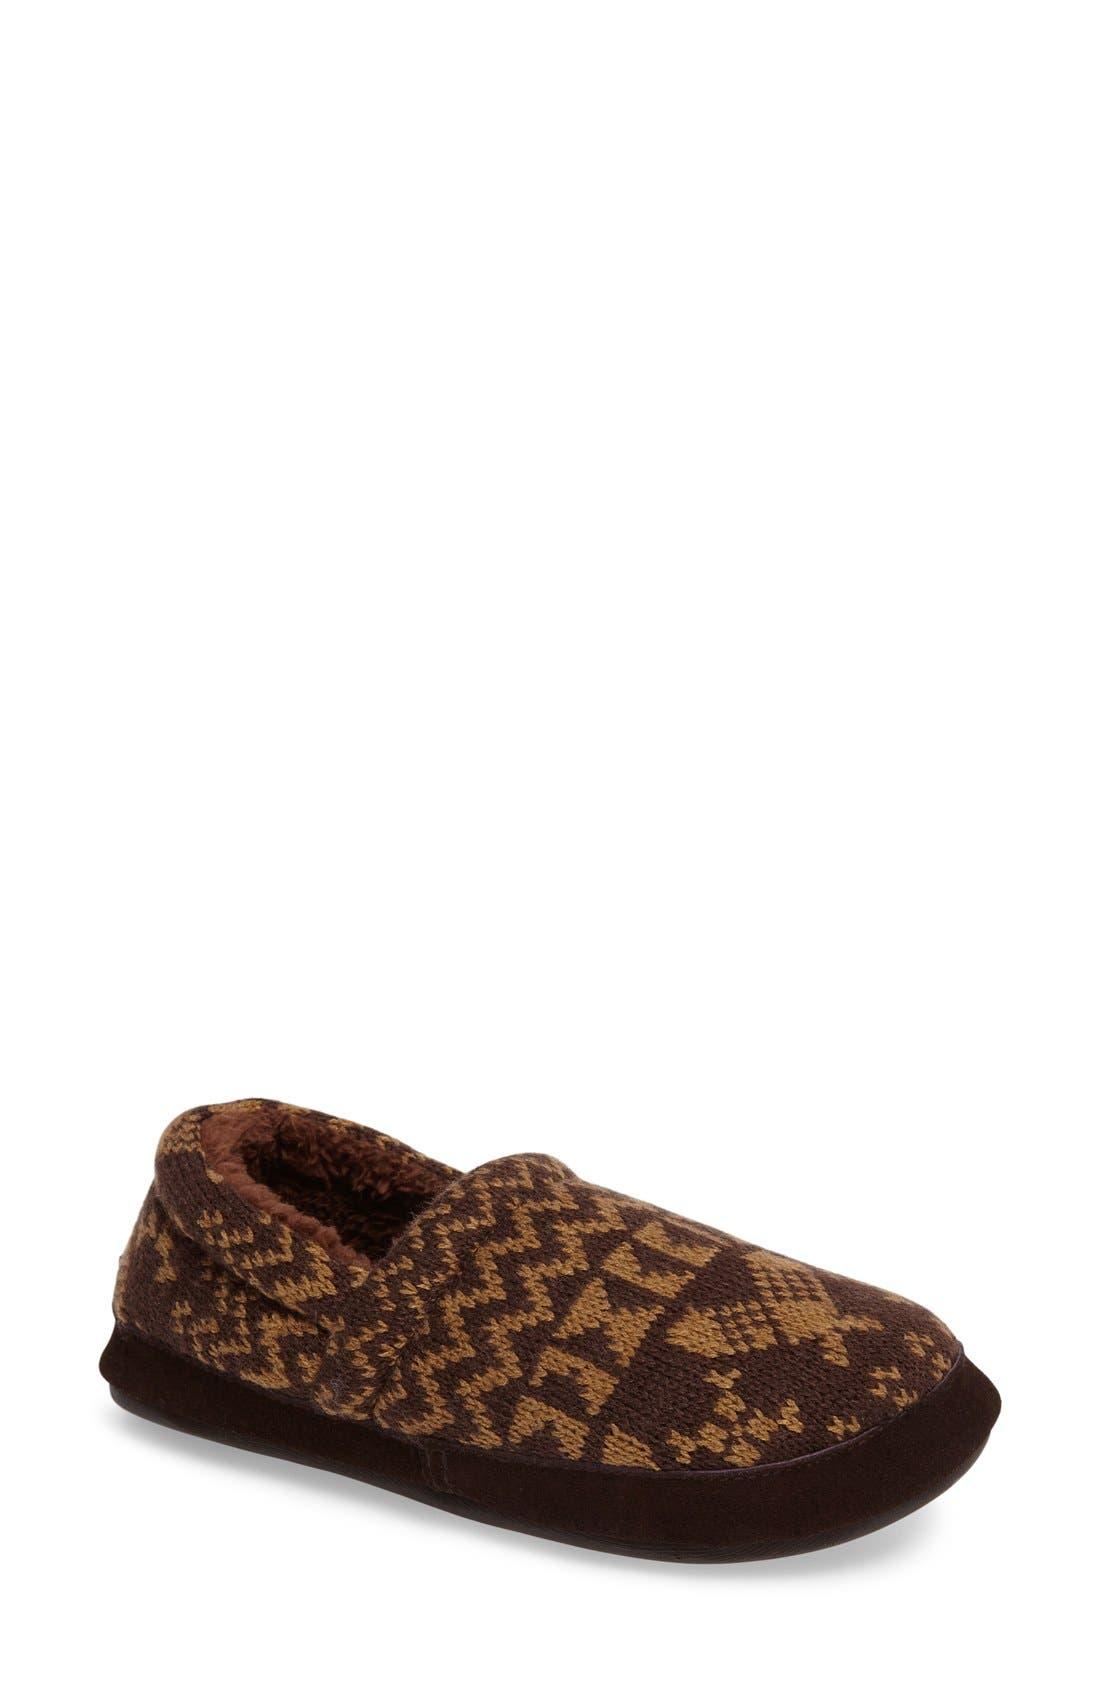 Whitecap Knit Slipper,                         Main,                         color, Java Snowshoe Fabric